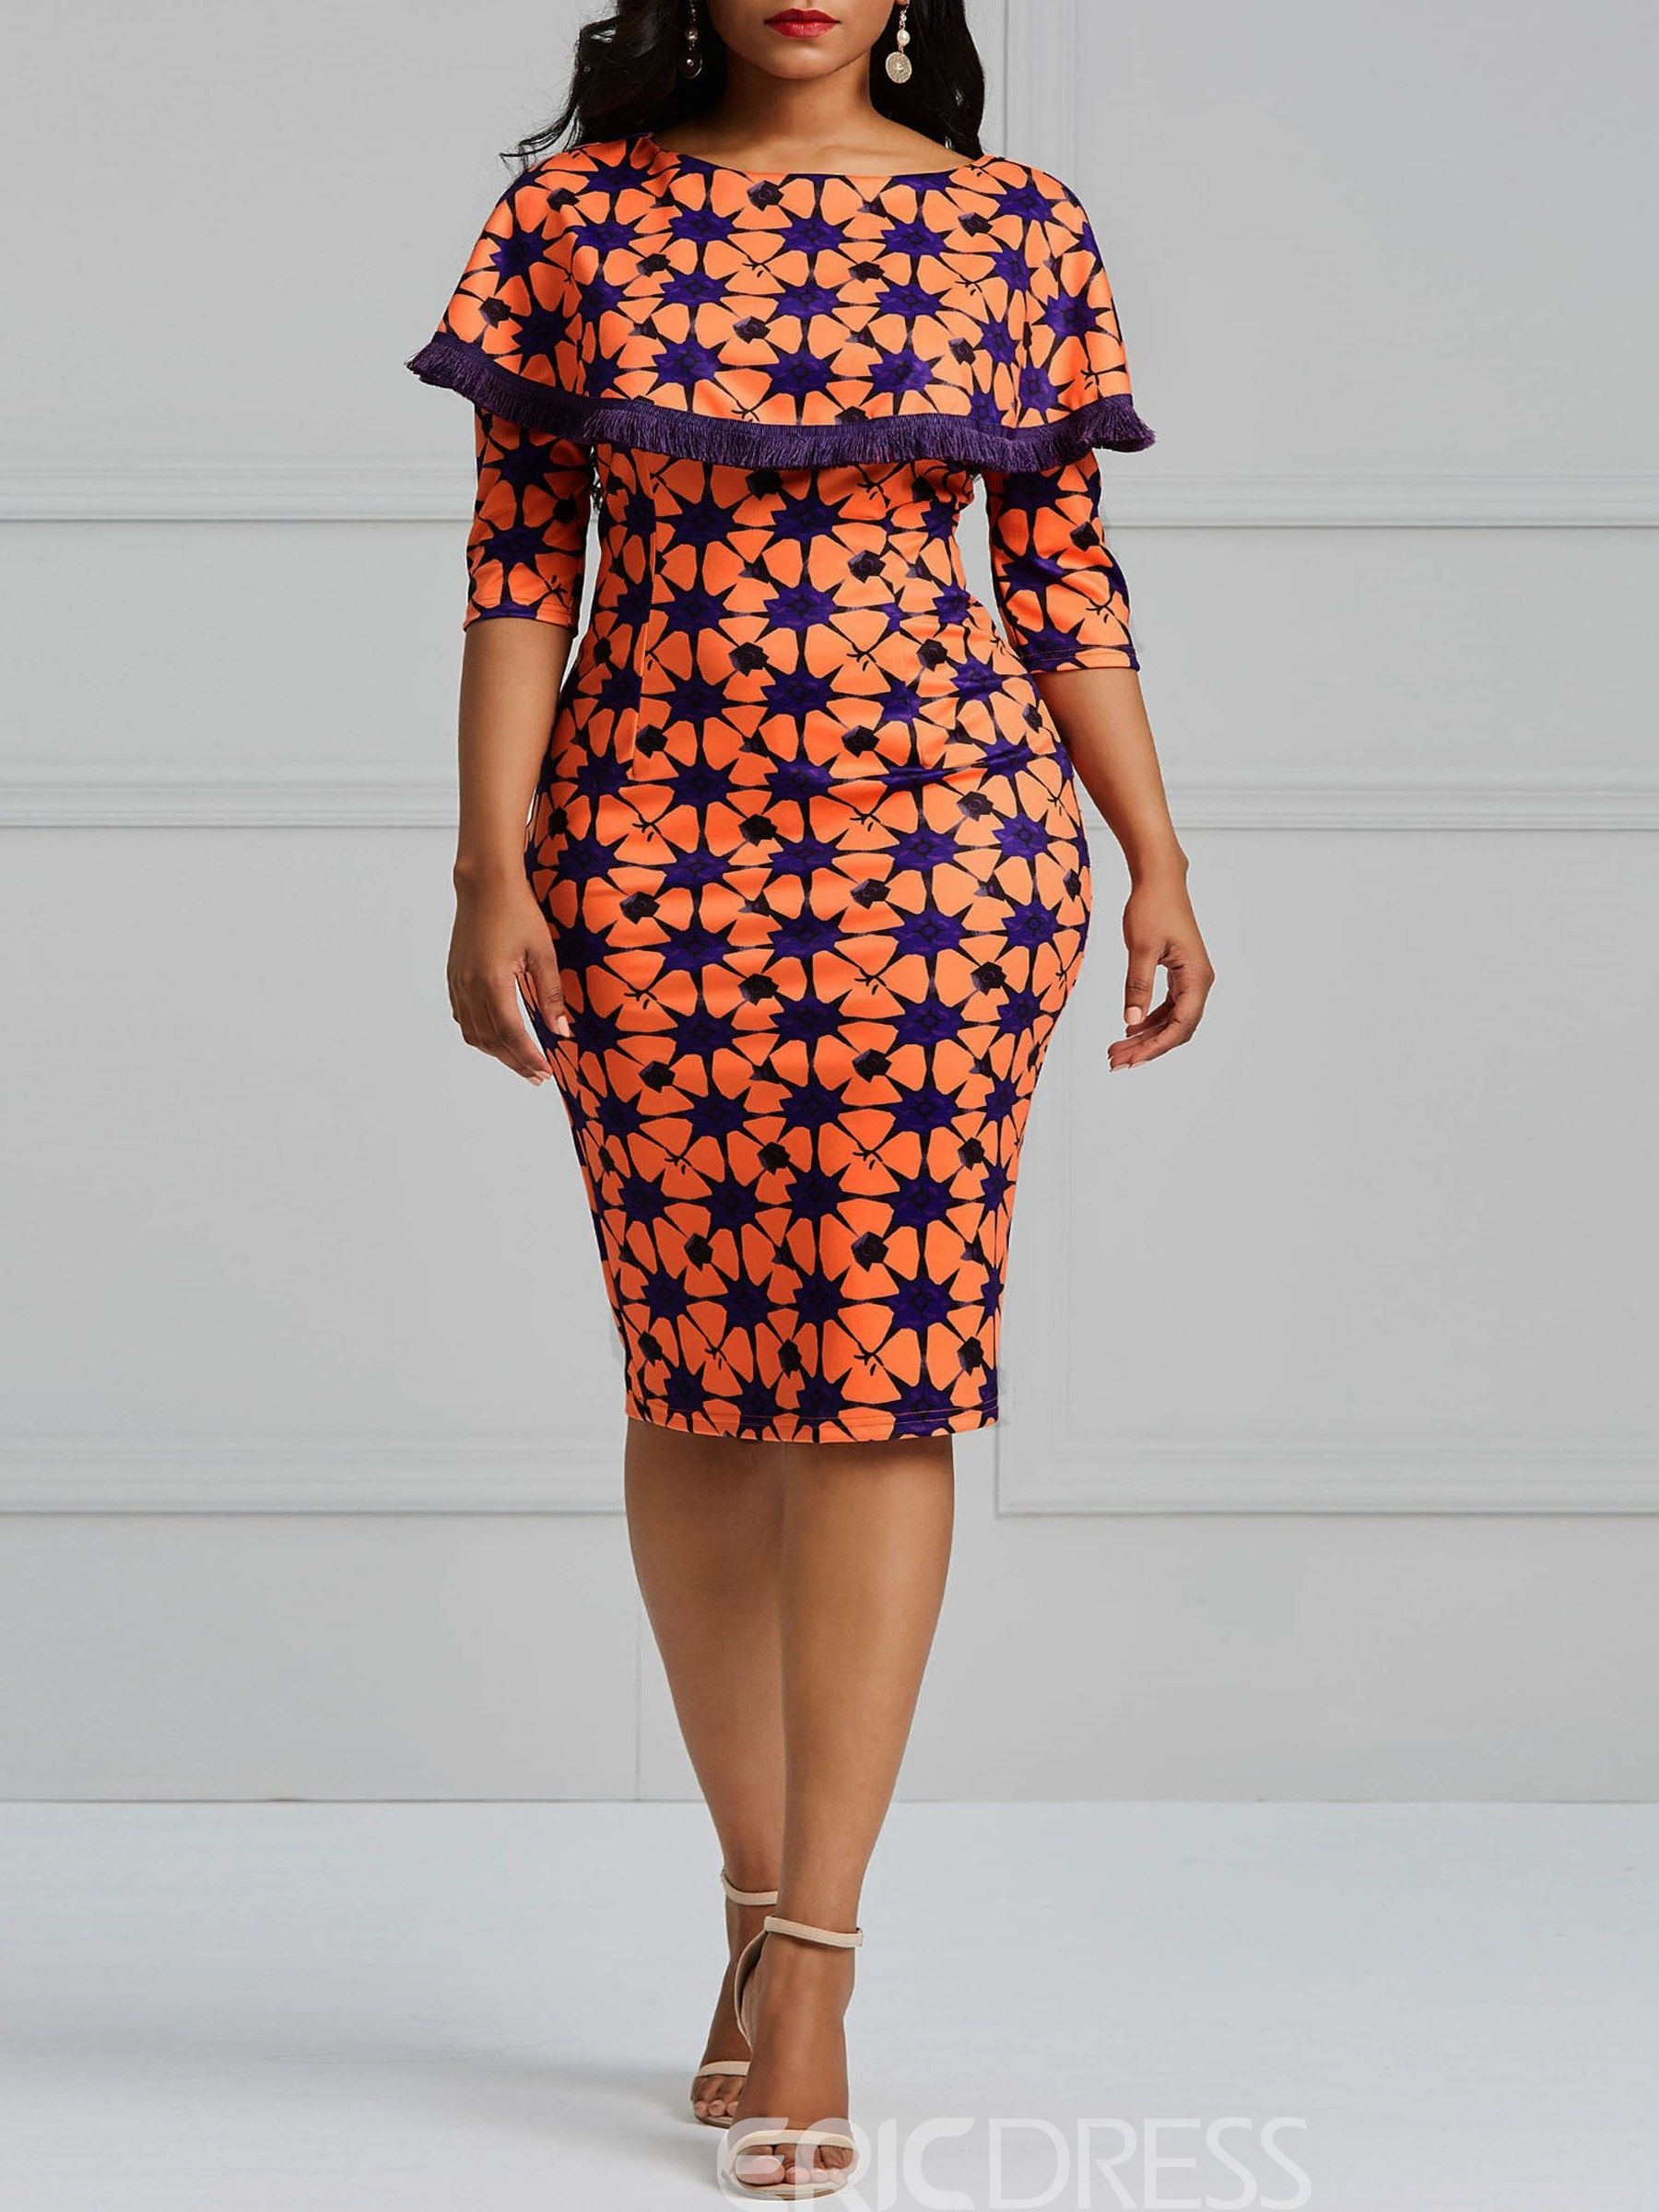 281d5ec86ff Ericdress Bodycon Geometric Print Women's Dress | Dresses in 2019 ...